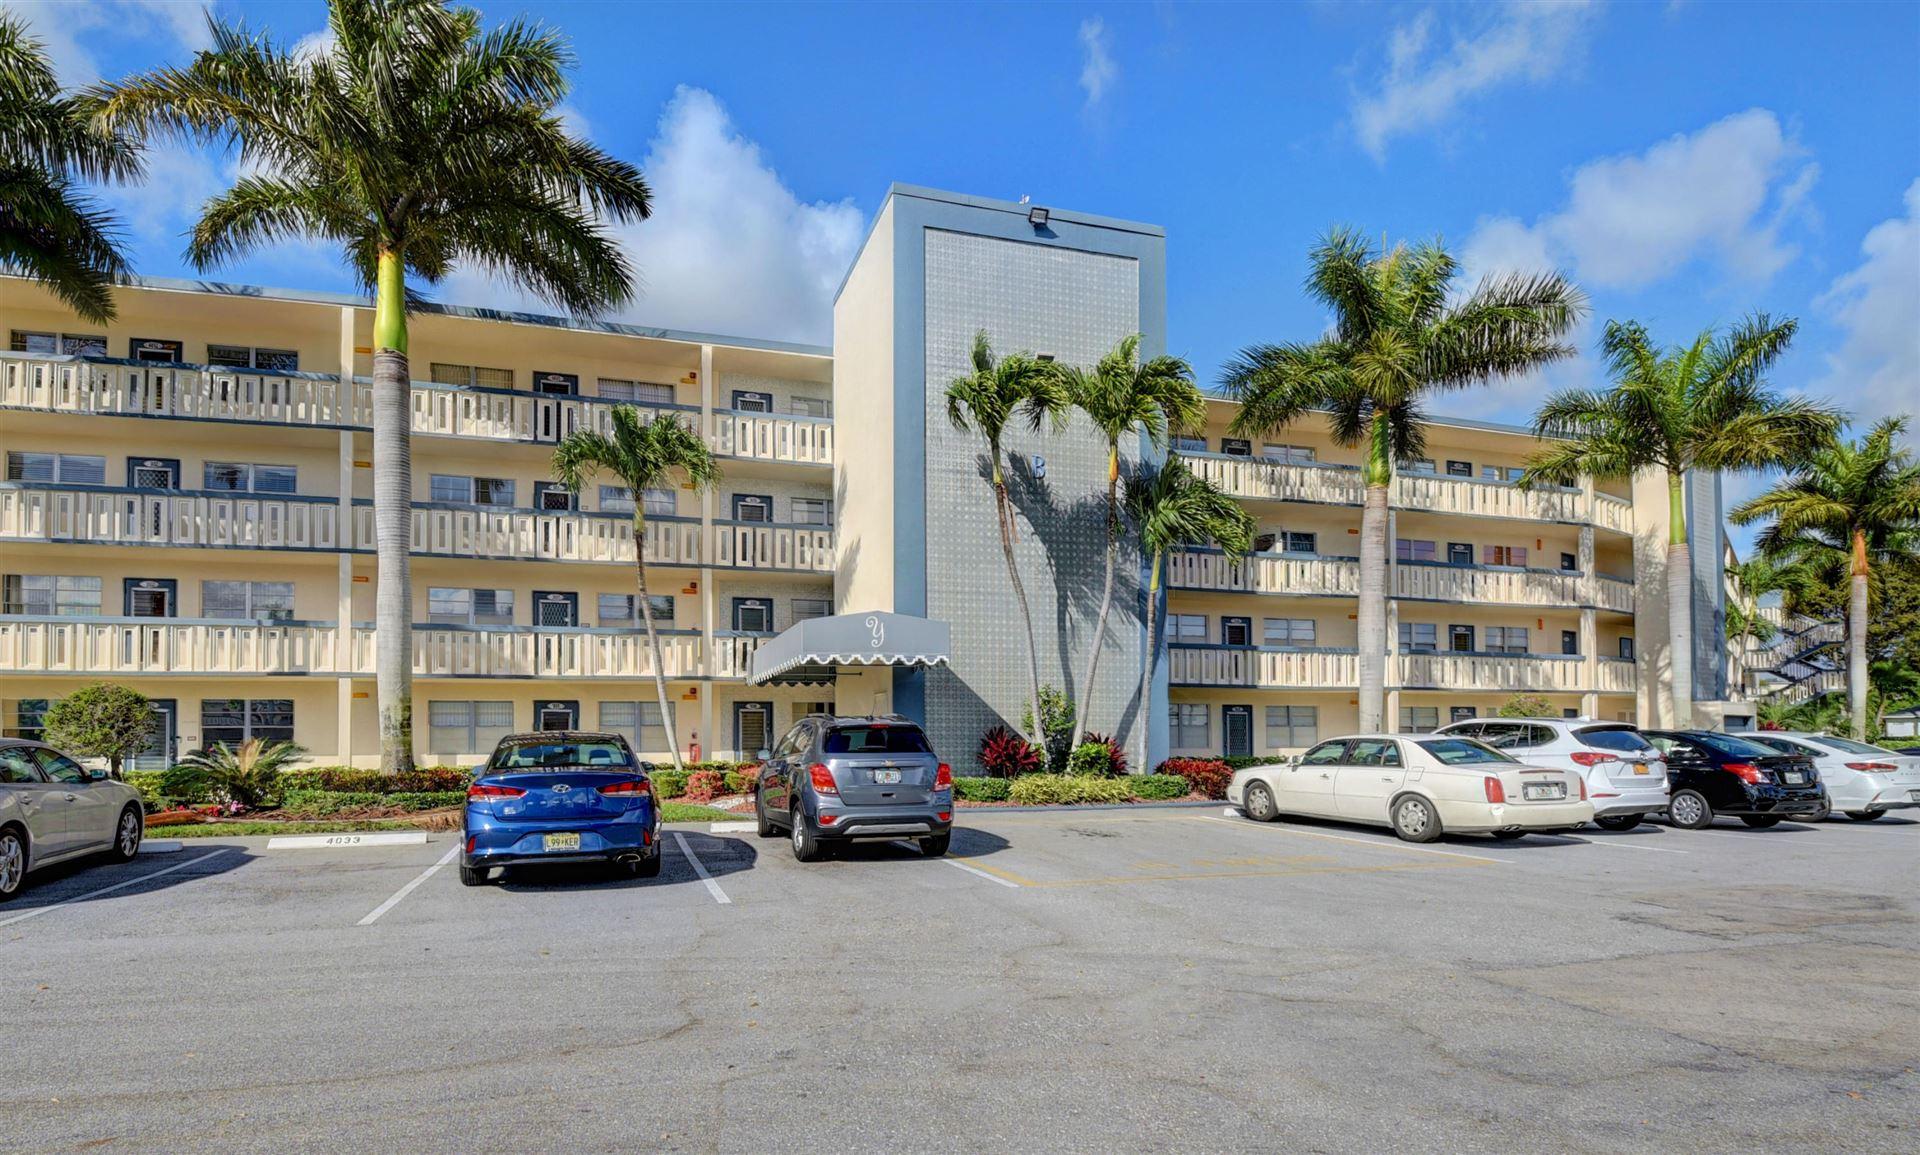 4027 Yarmouth B, Boca Raton, FL 33434 - #: RX-10611746